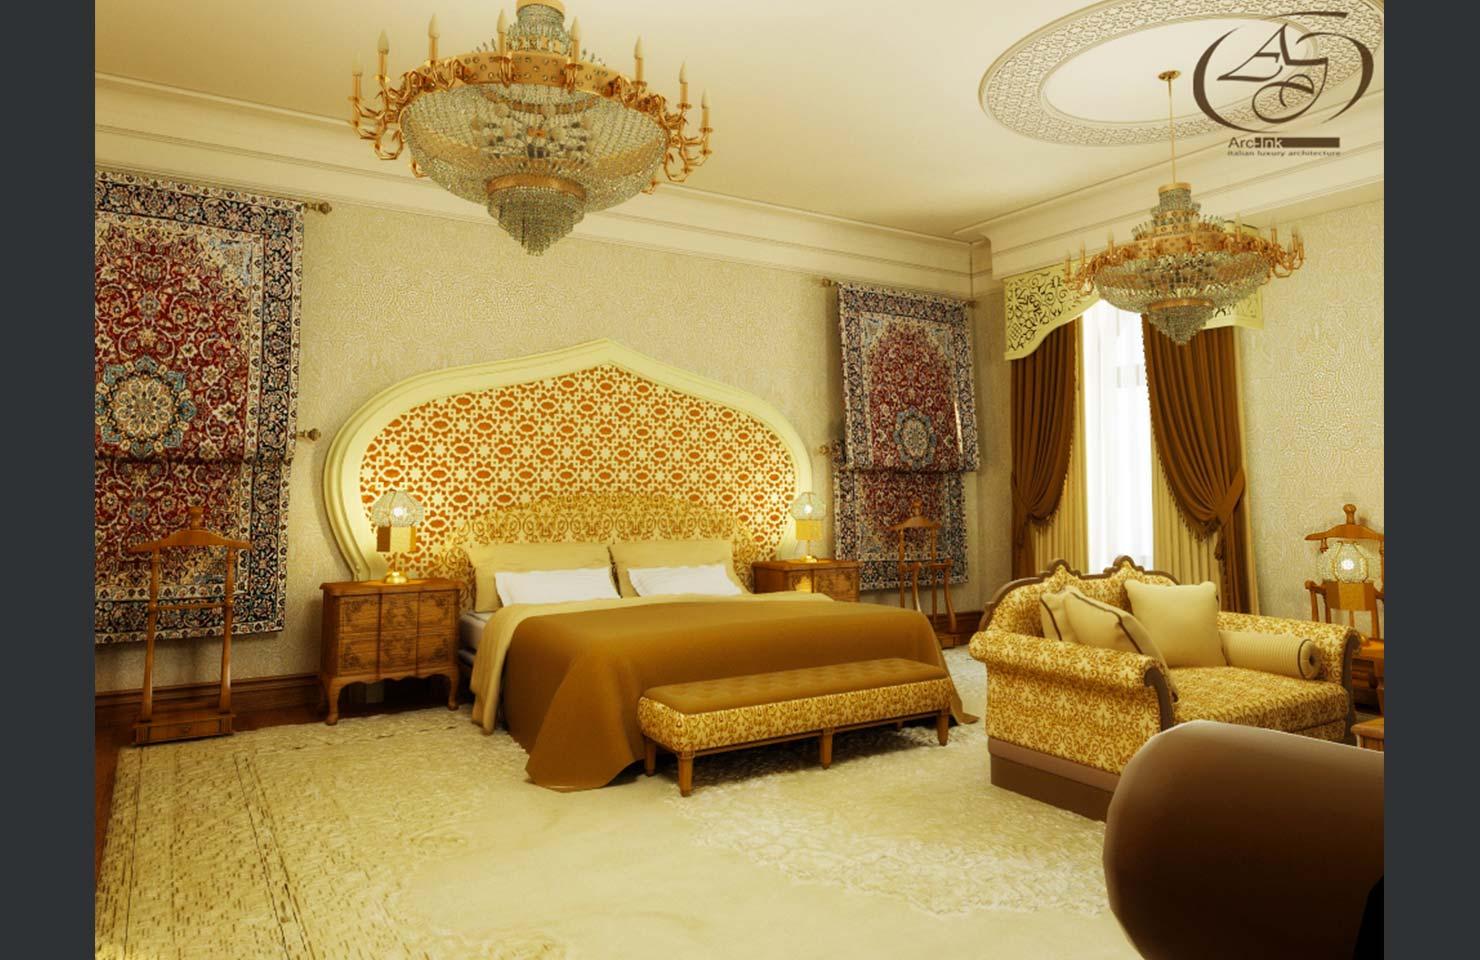 Astana (Kazakistan)